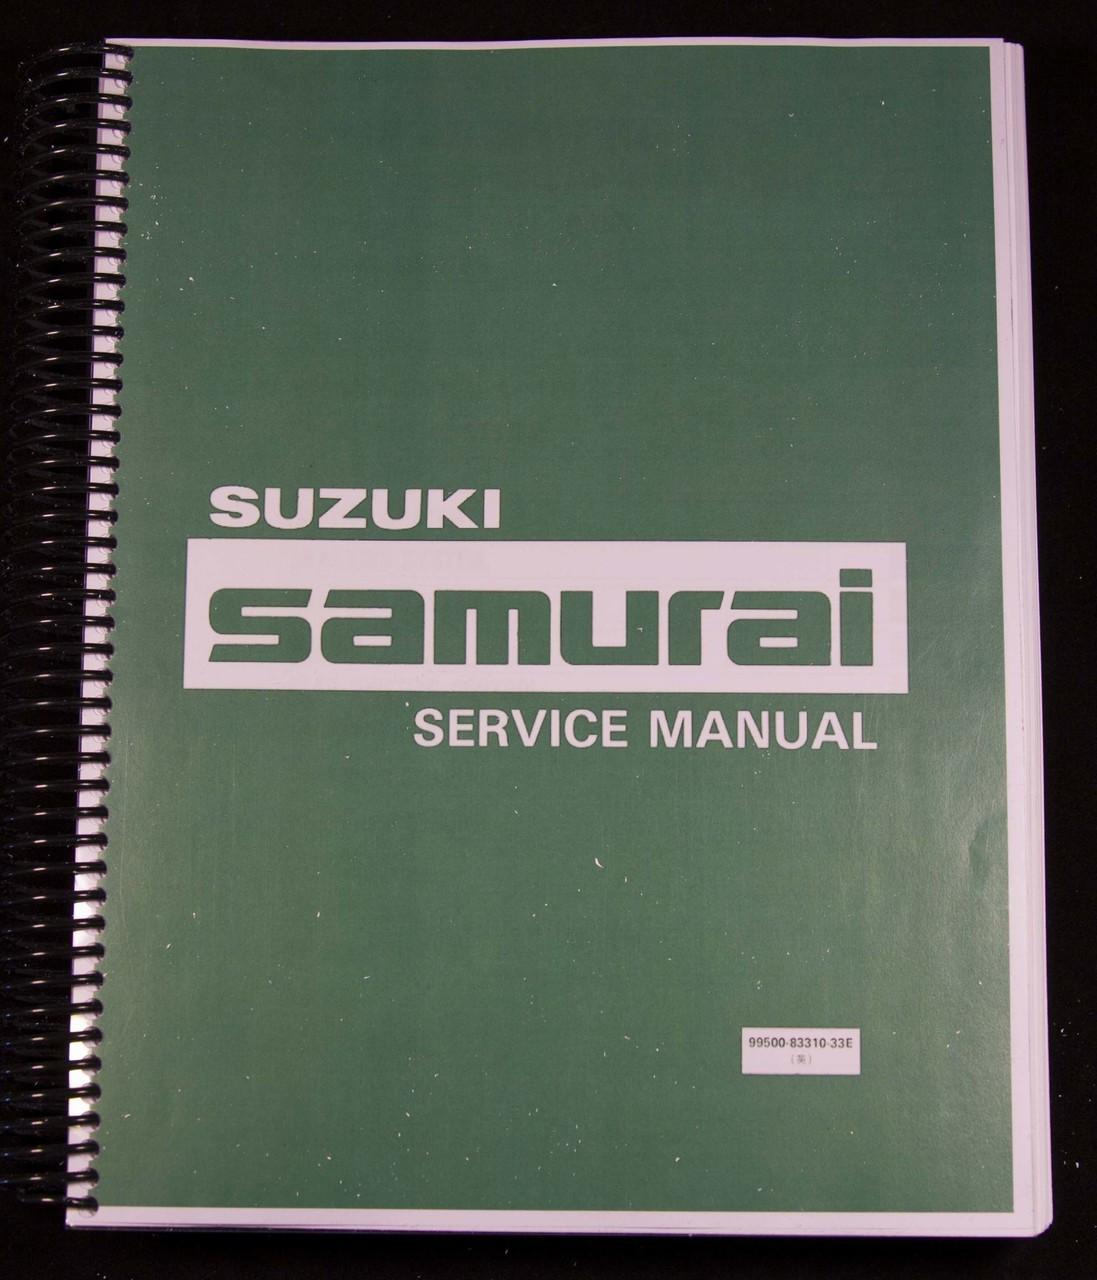 Suzuki Samurai Factory Service Manual - 1986-1988